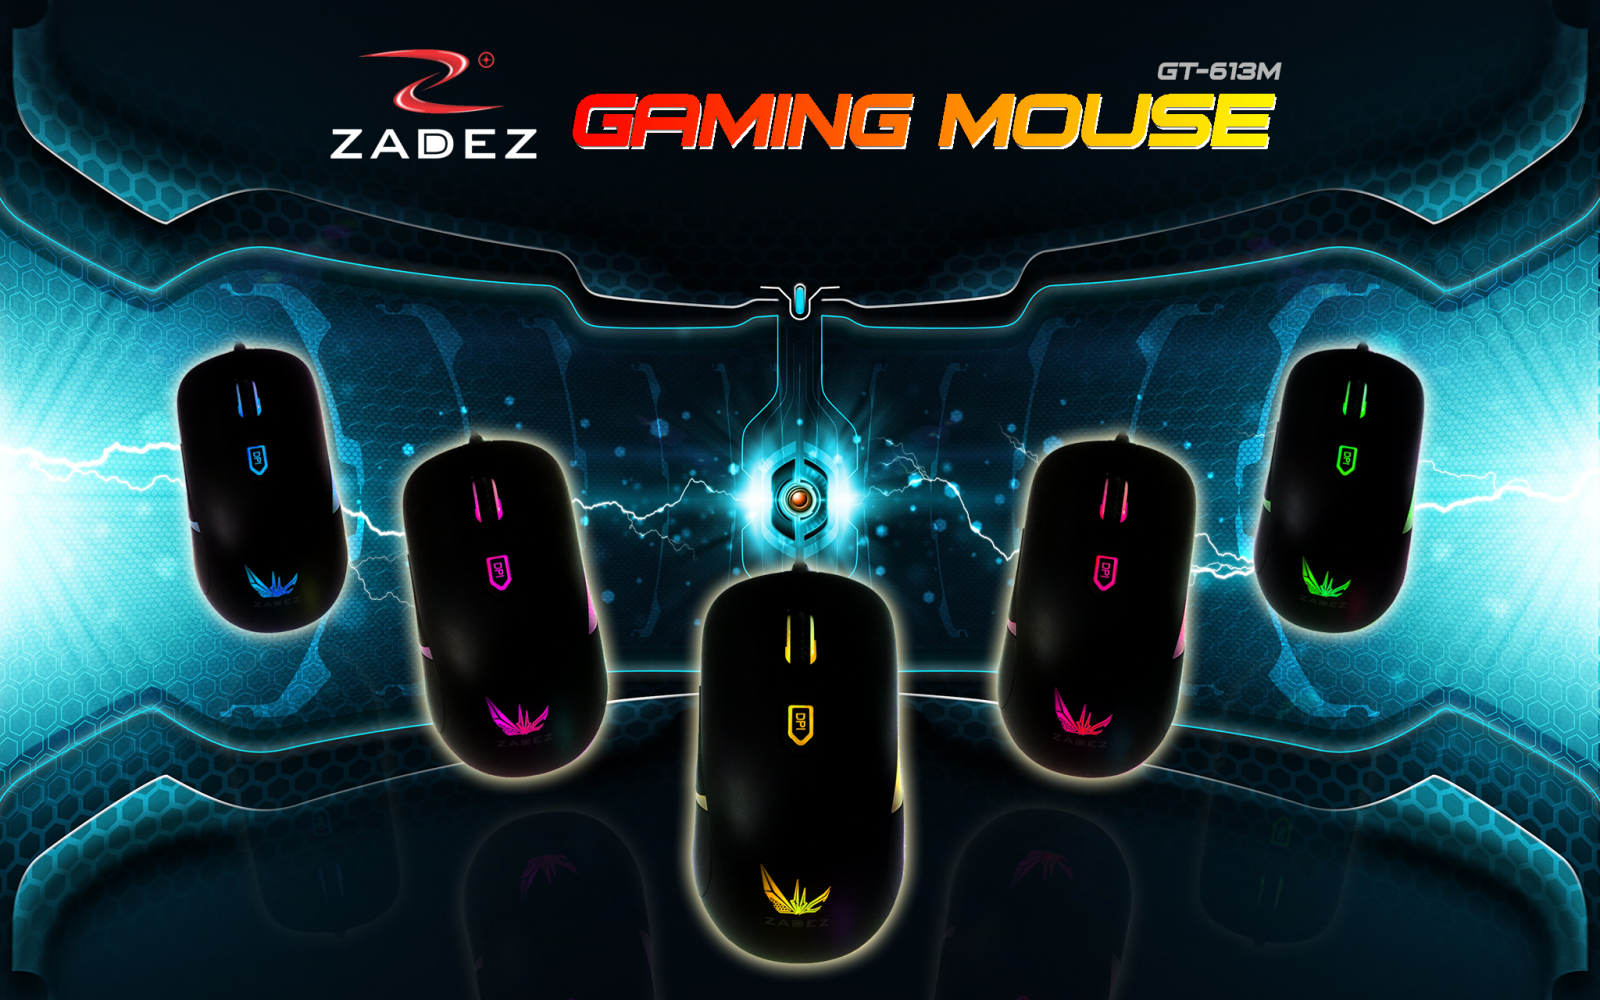 Zadez Gaming Mouse GT-613M